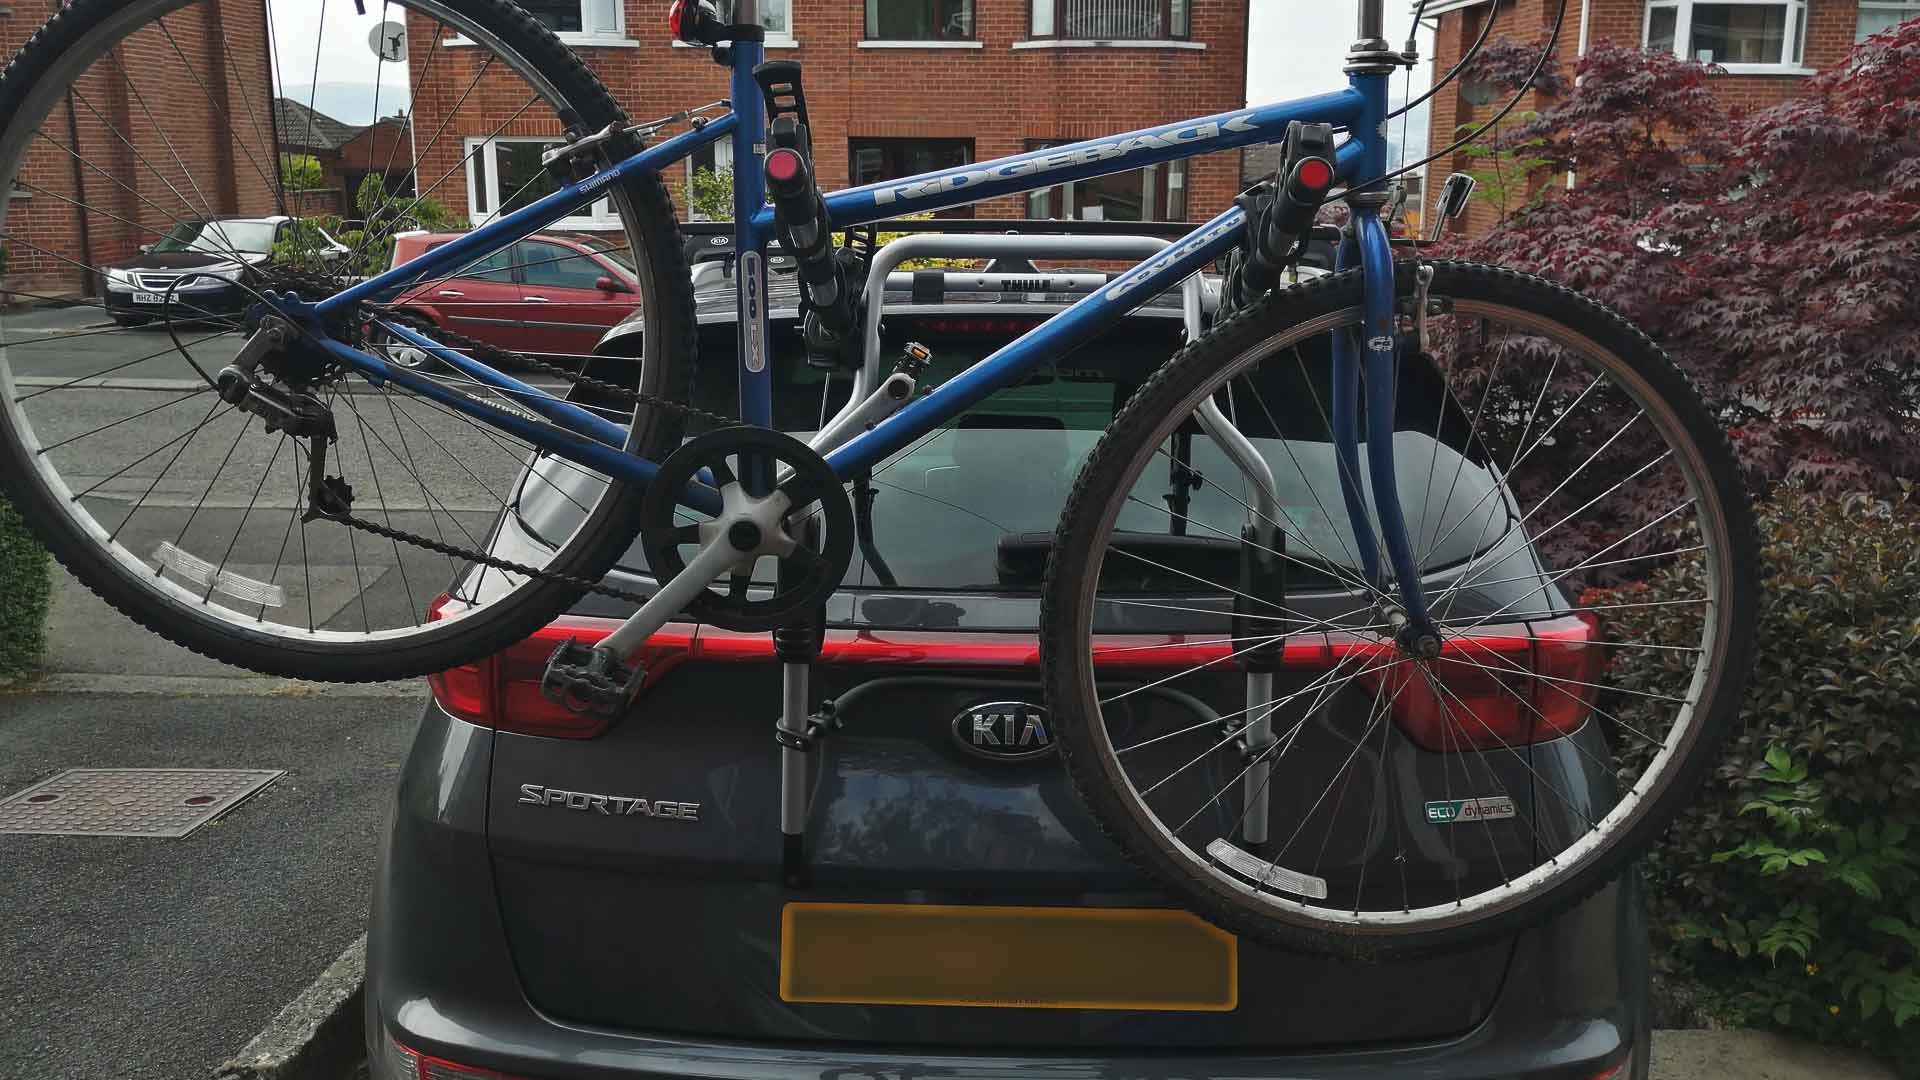 kia sportage bike rack